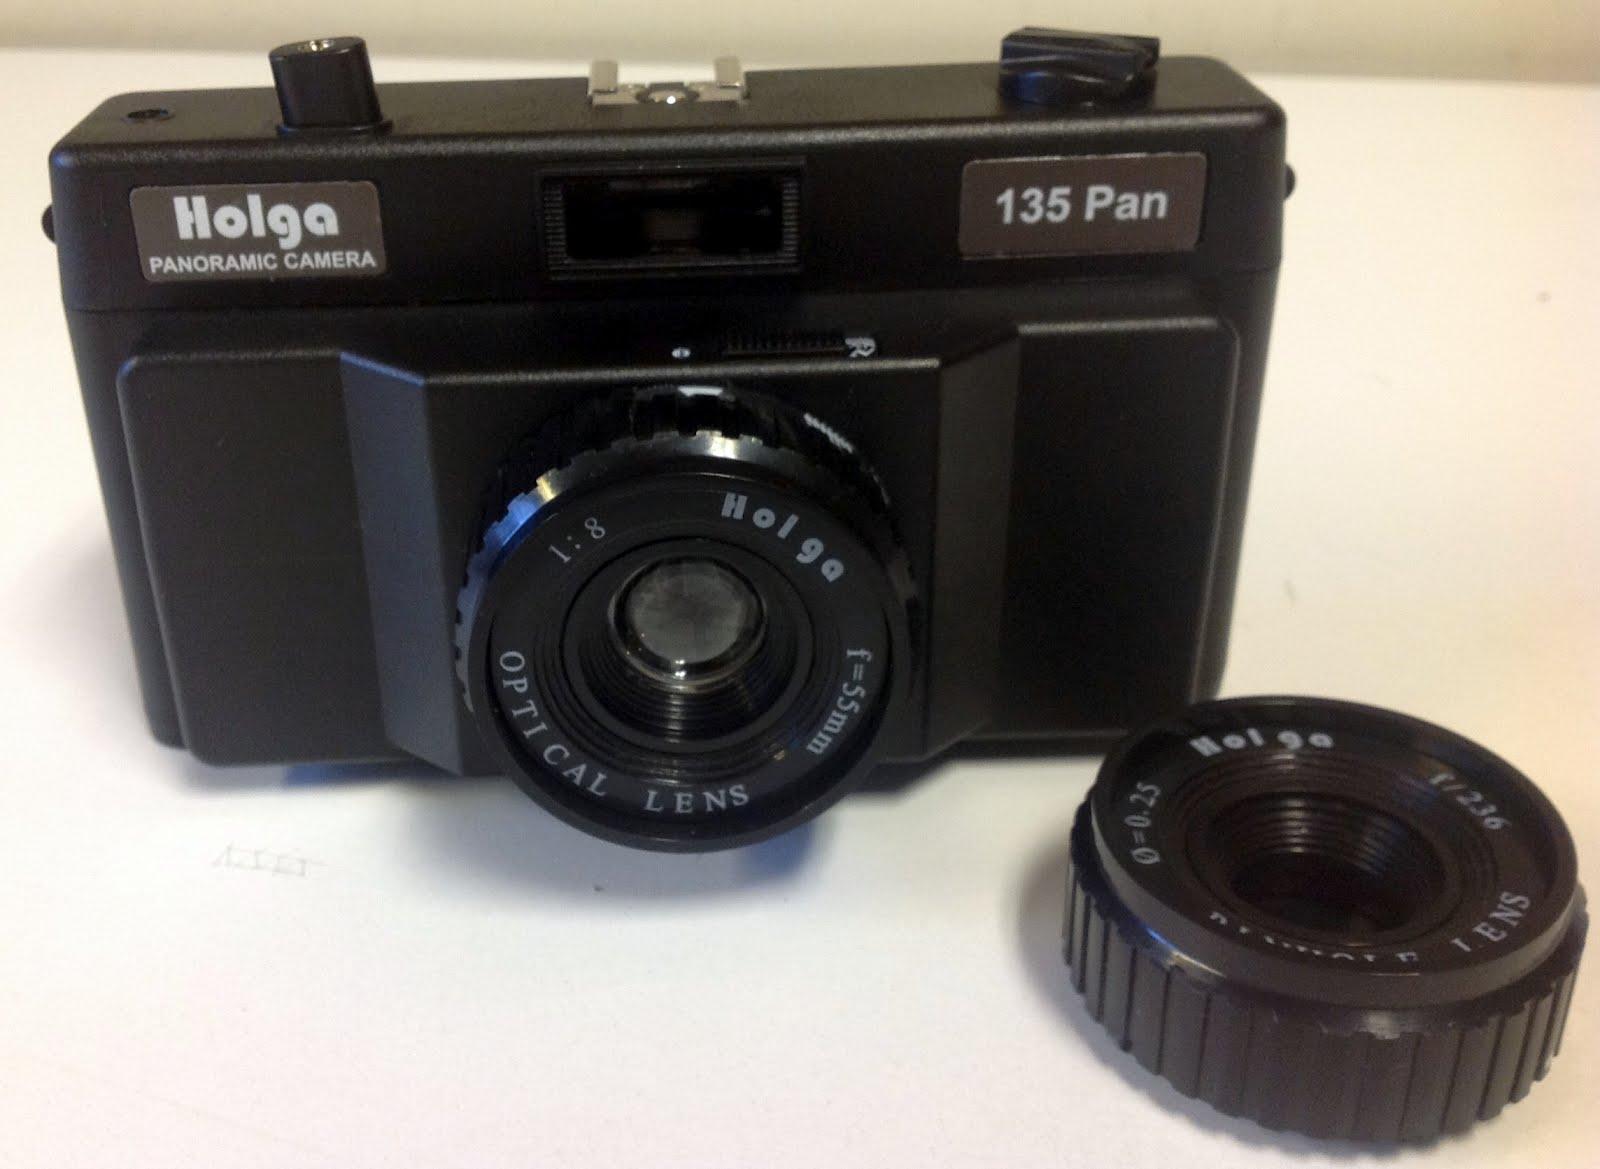 Random Camera Blog: The Holga 135 Pan - A Quick Review